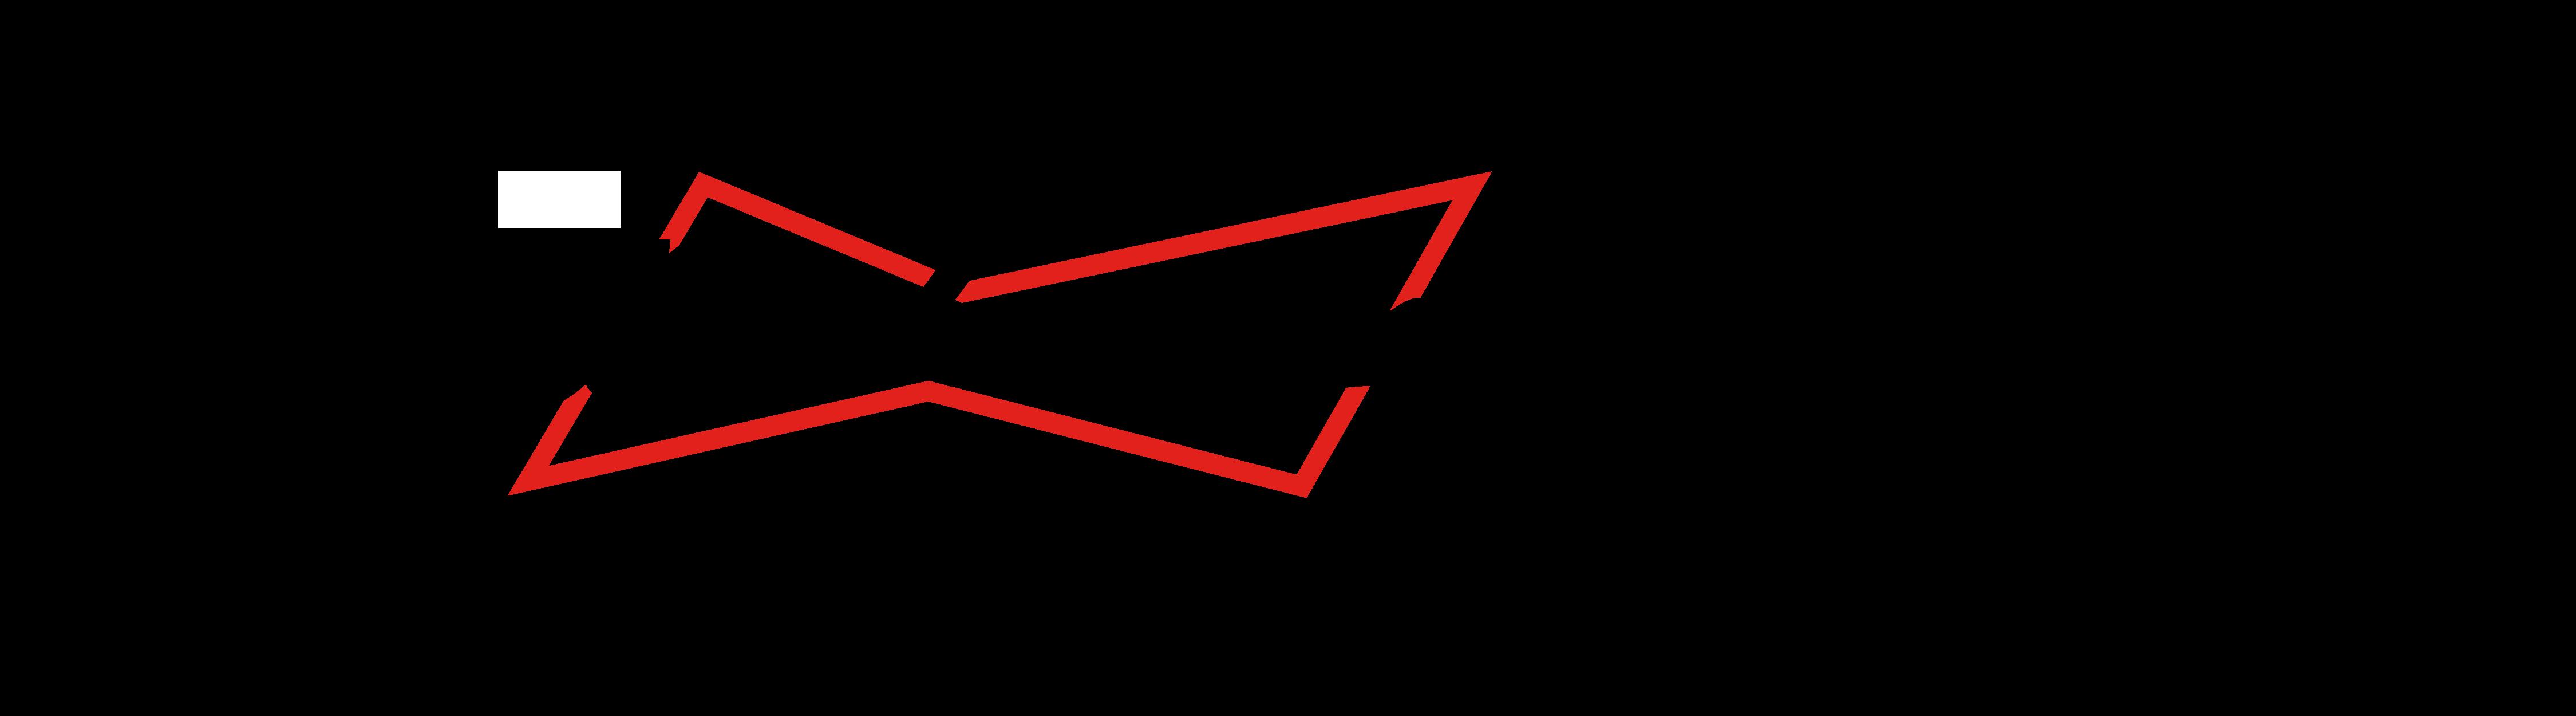 biergarten 2020 logo